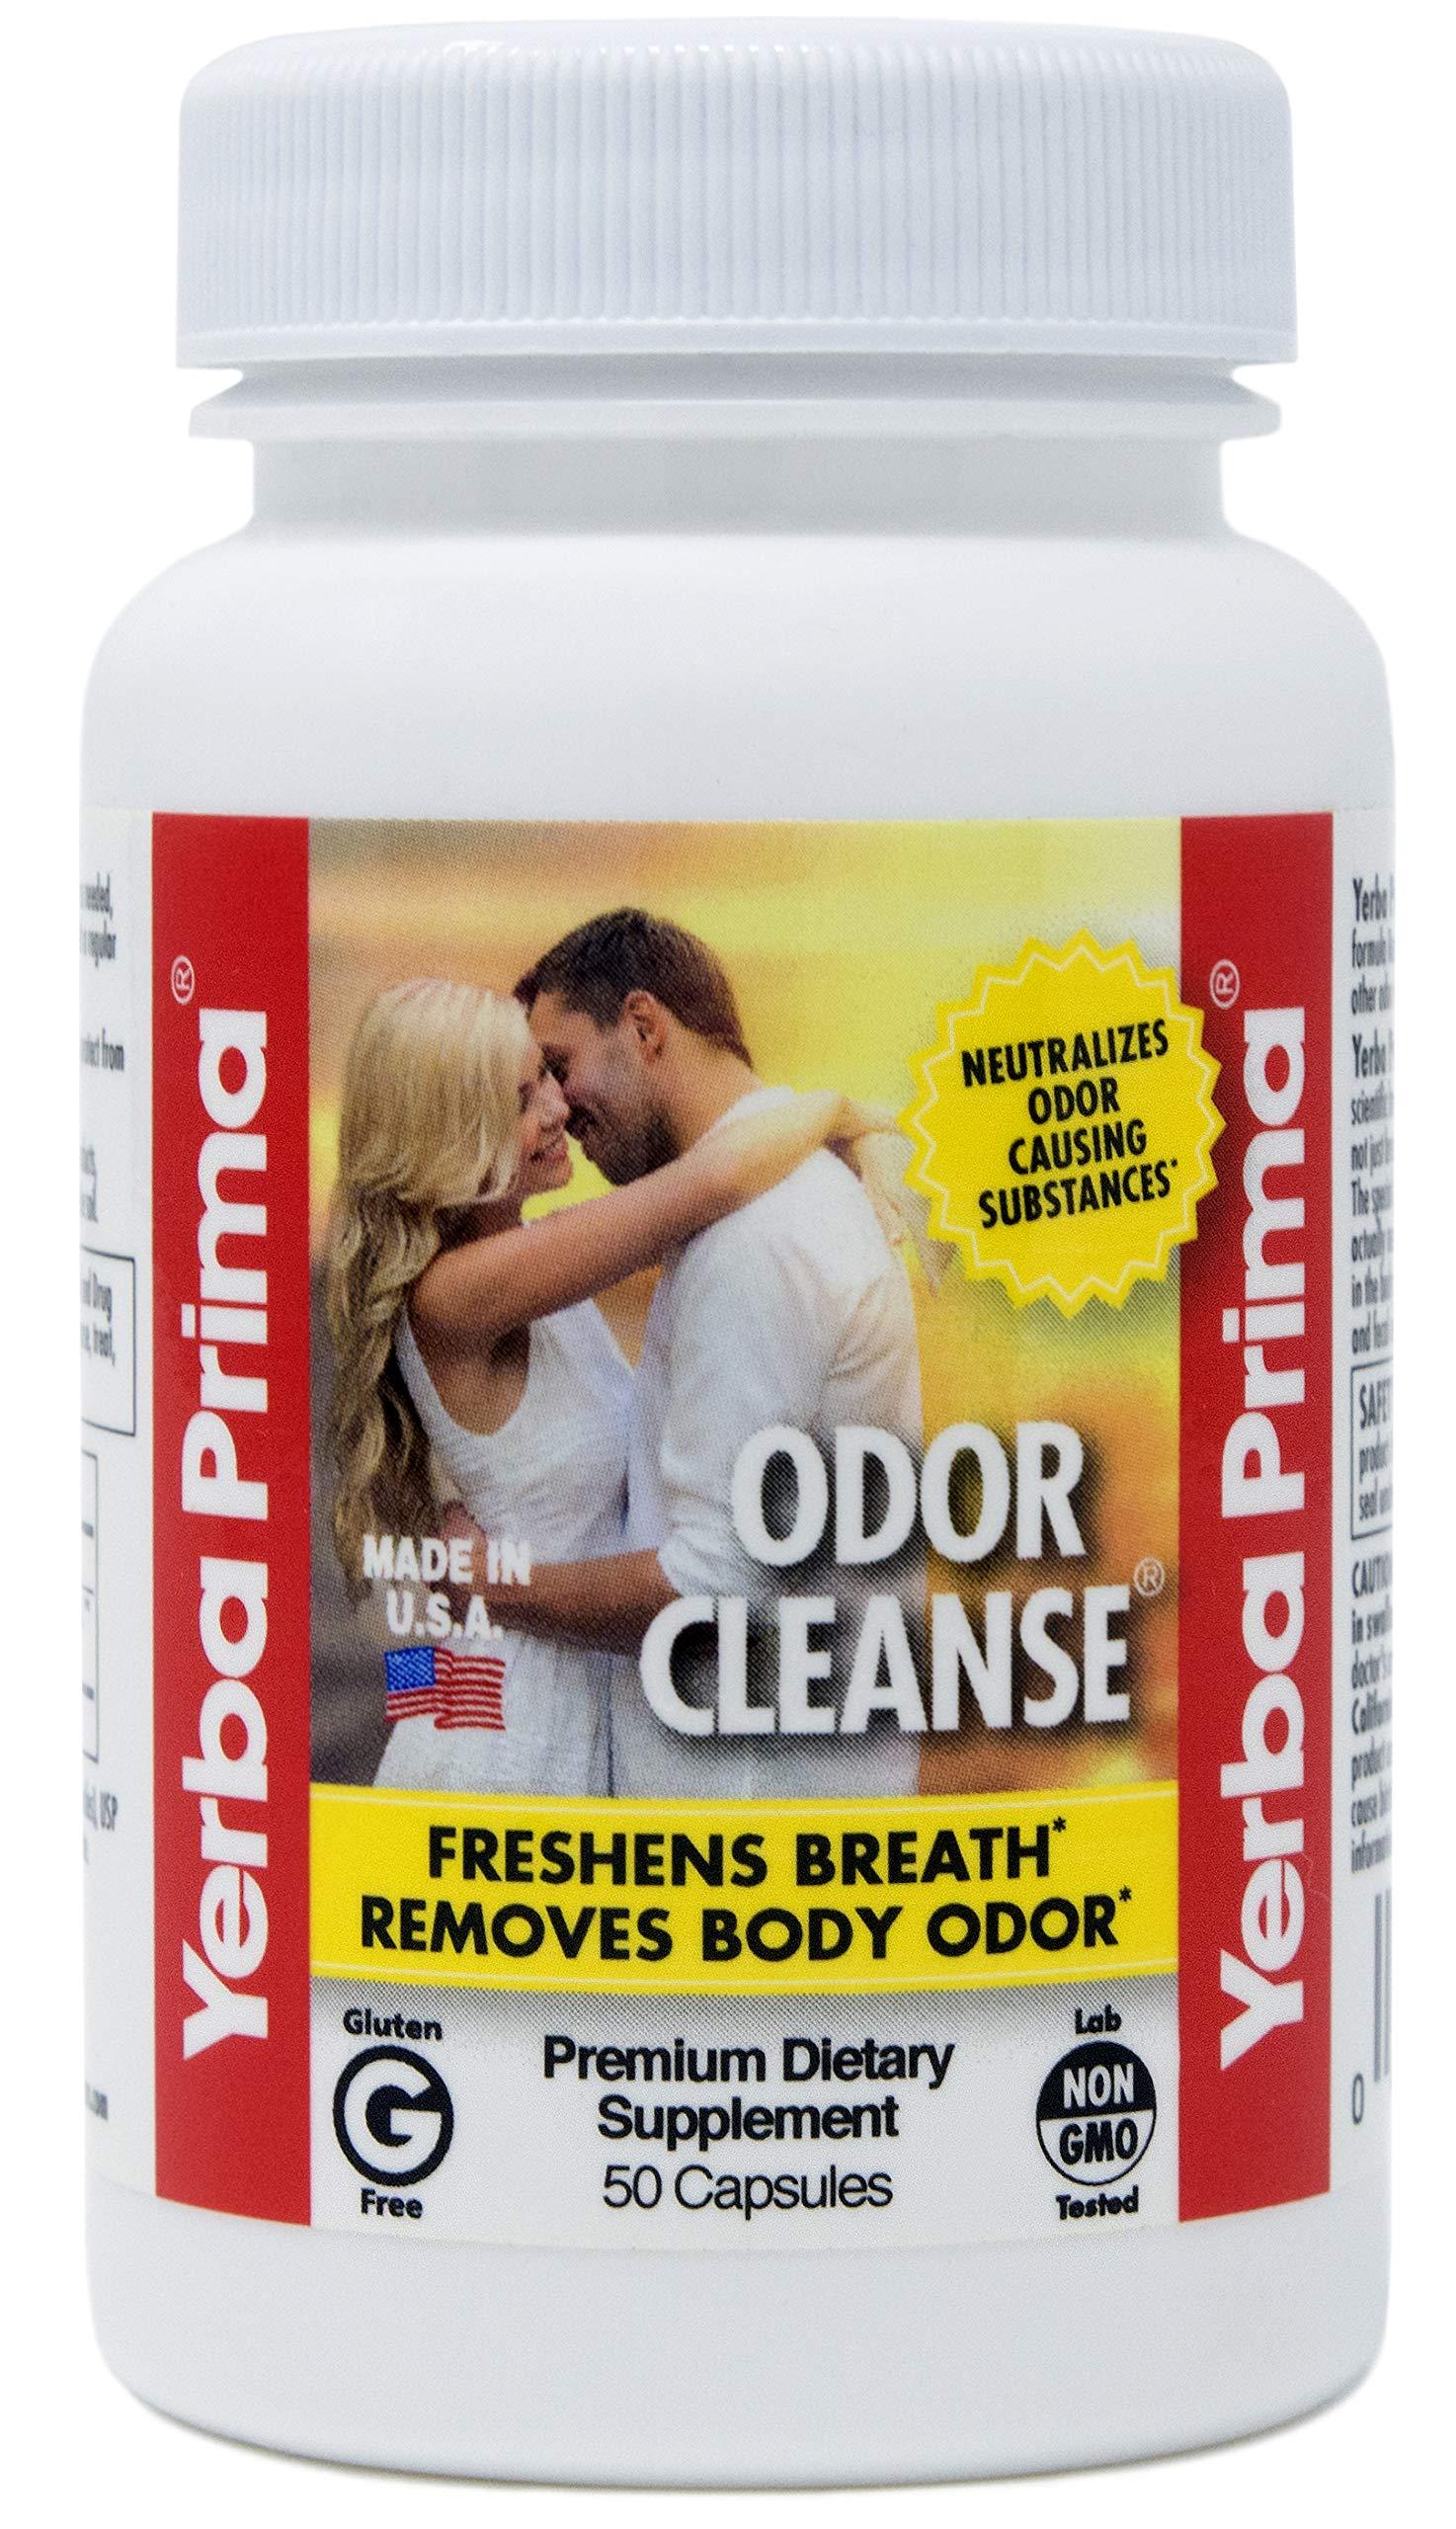 Yerba Prima Odor Cleanse, Breath and Body Capsules, 50 Capsules